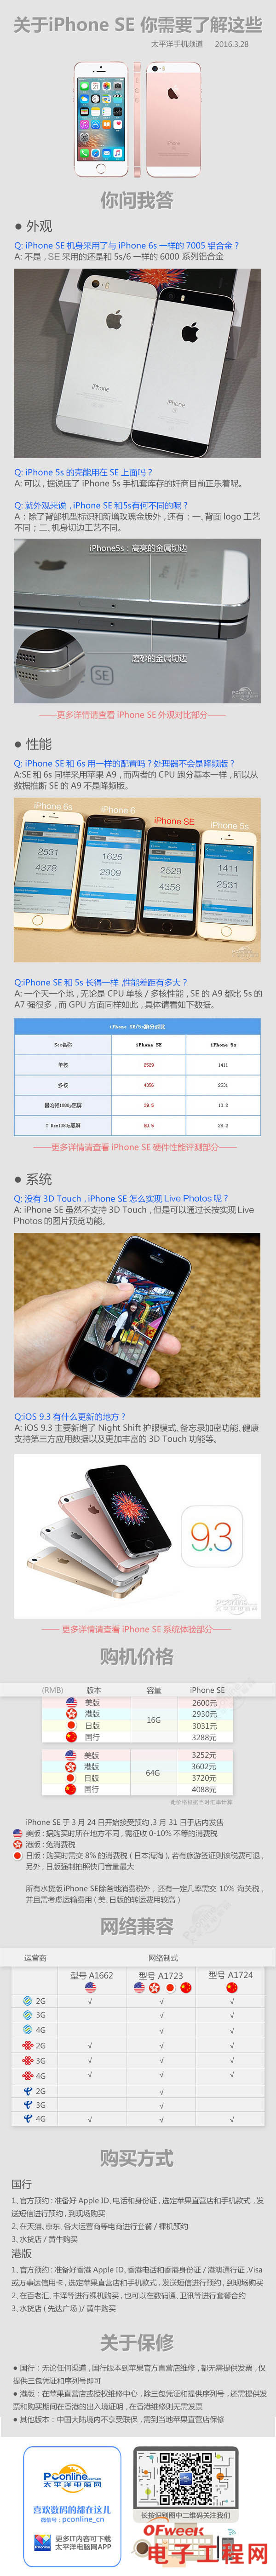 iPhone SE深度评测:集iPhone 5s与iPhone 6s之大成